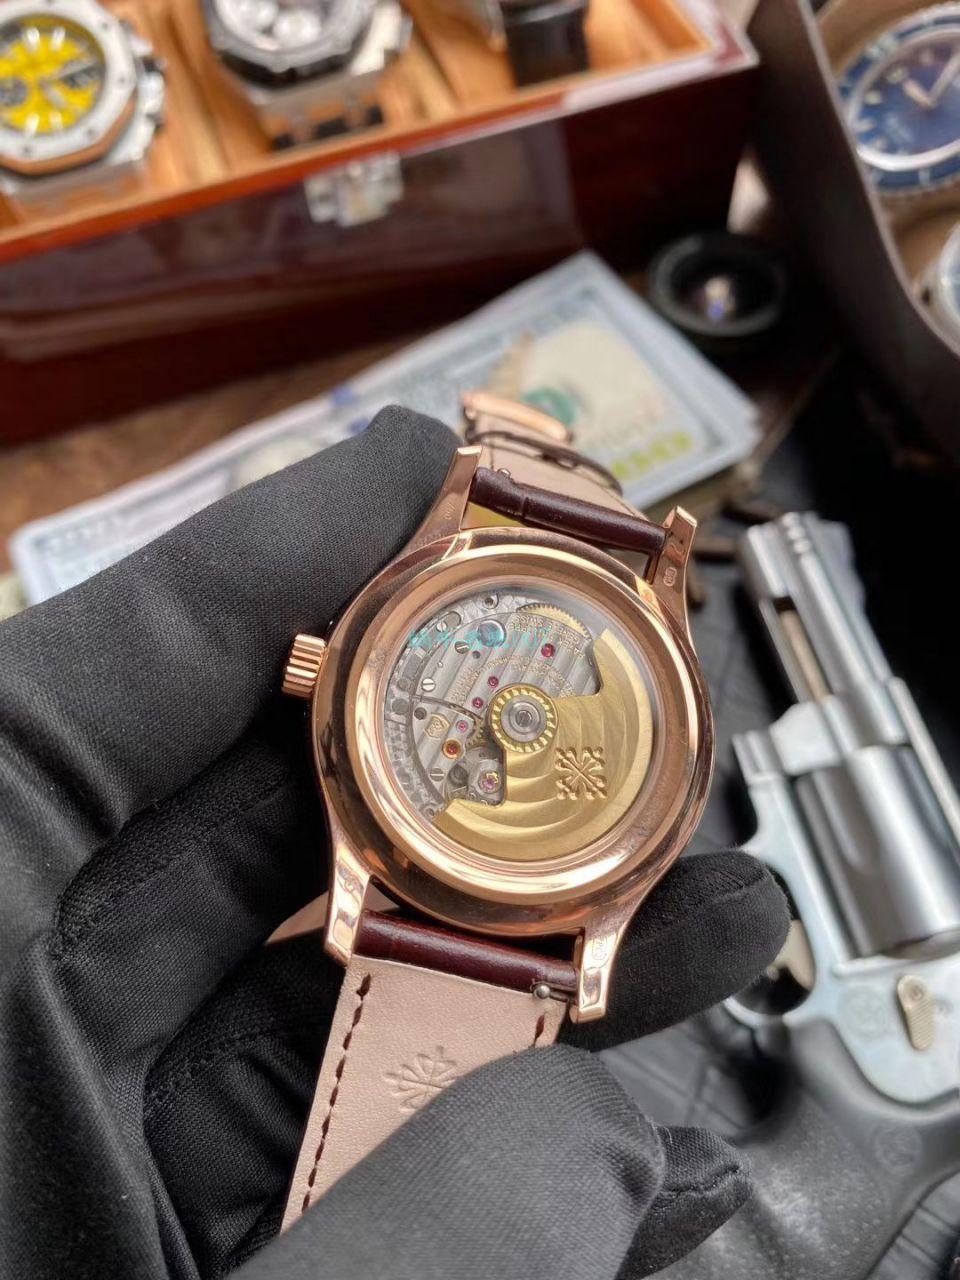 GR厂V2版本百达翡丽高仿手表复杂功能时计系列5205R-001,5205R-010腕表